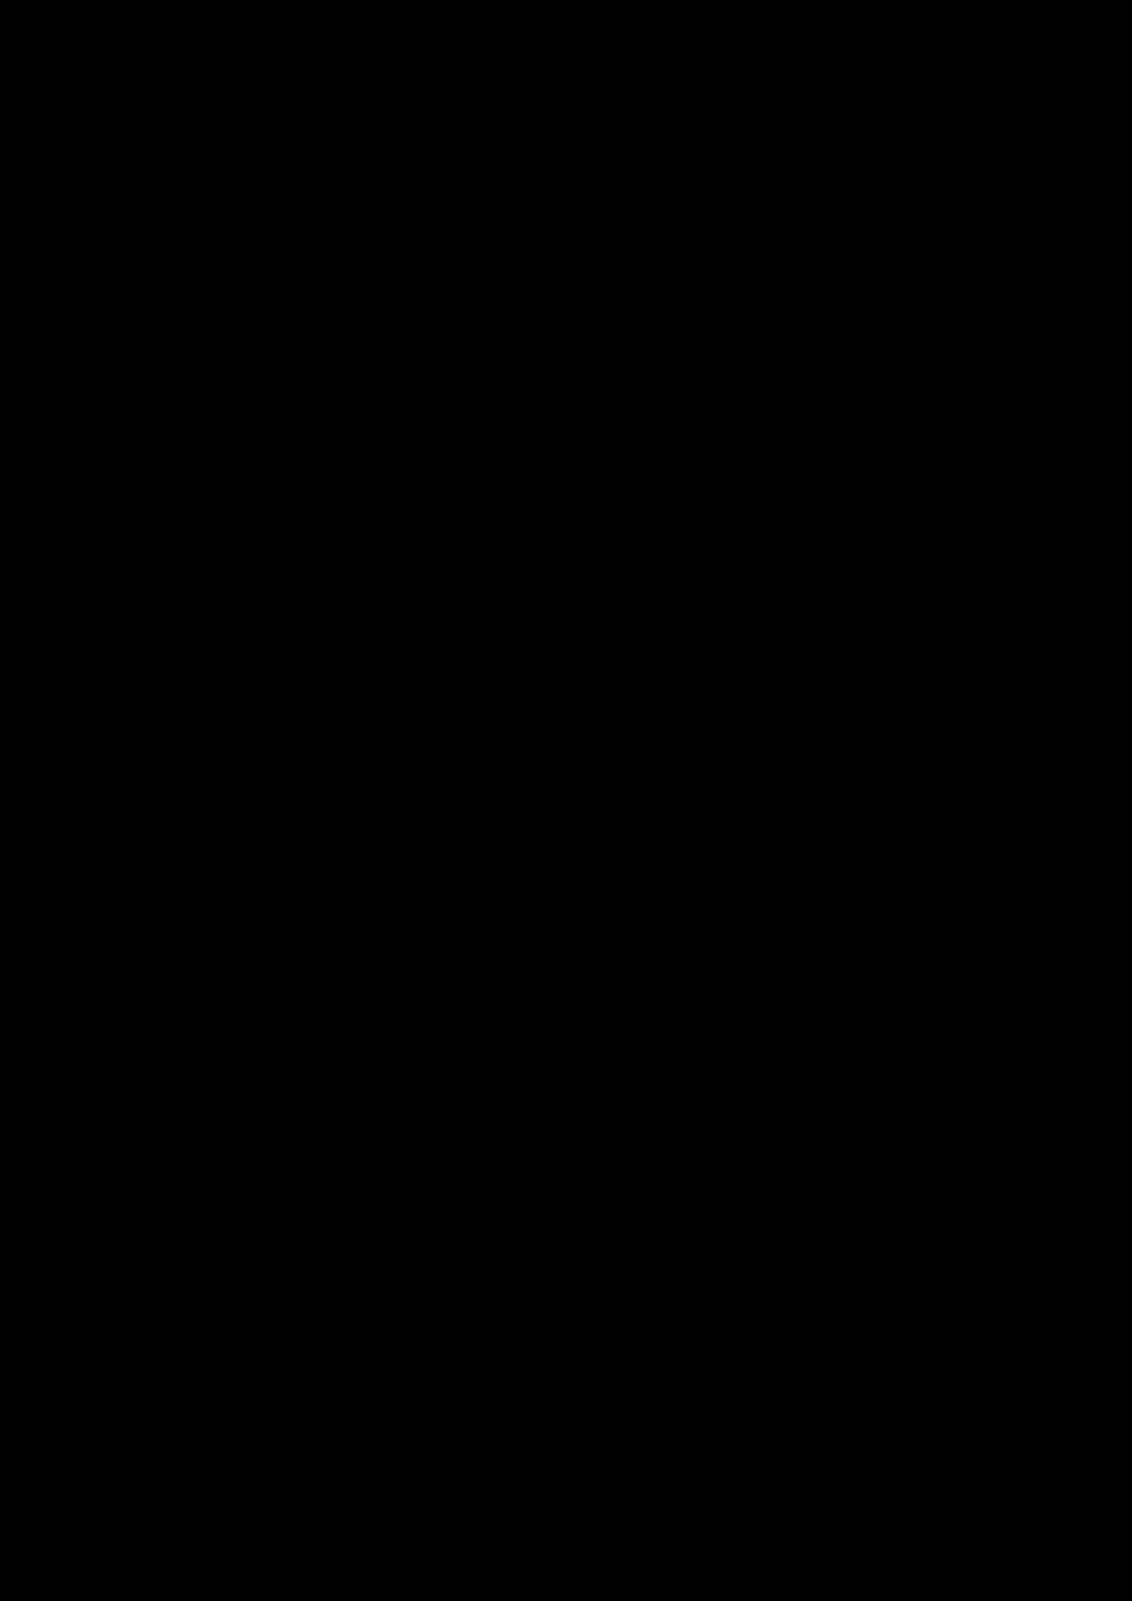 Belyiy sokol slide, Image 185